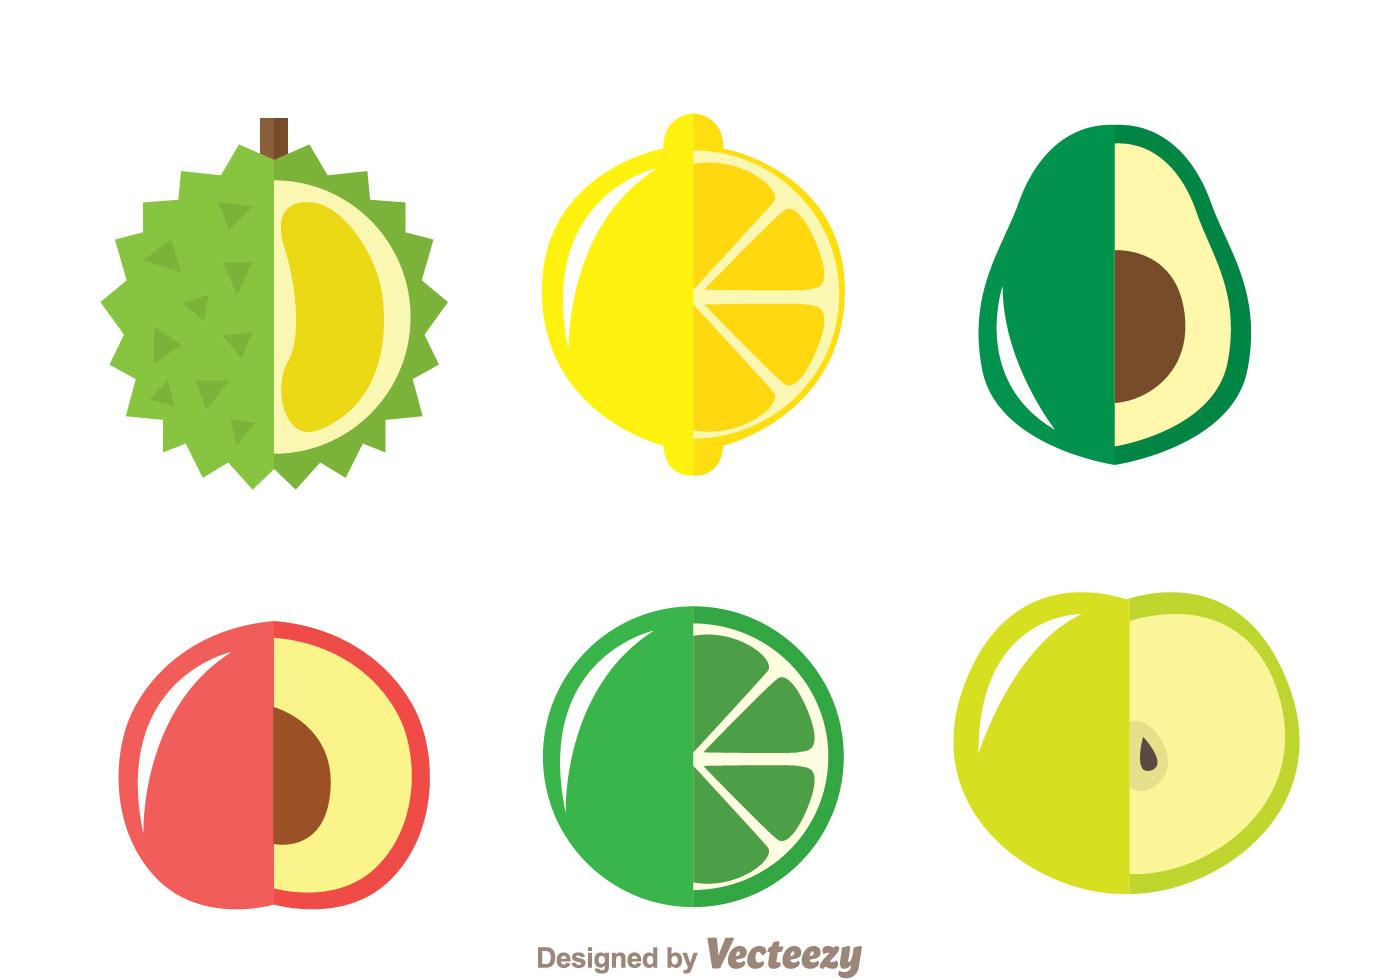 Cute Wedding Cartoon Wallpaper Fresh Fruits Icons Download Free Vector Art Stock